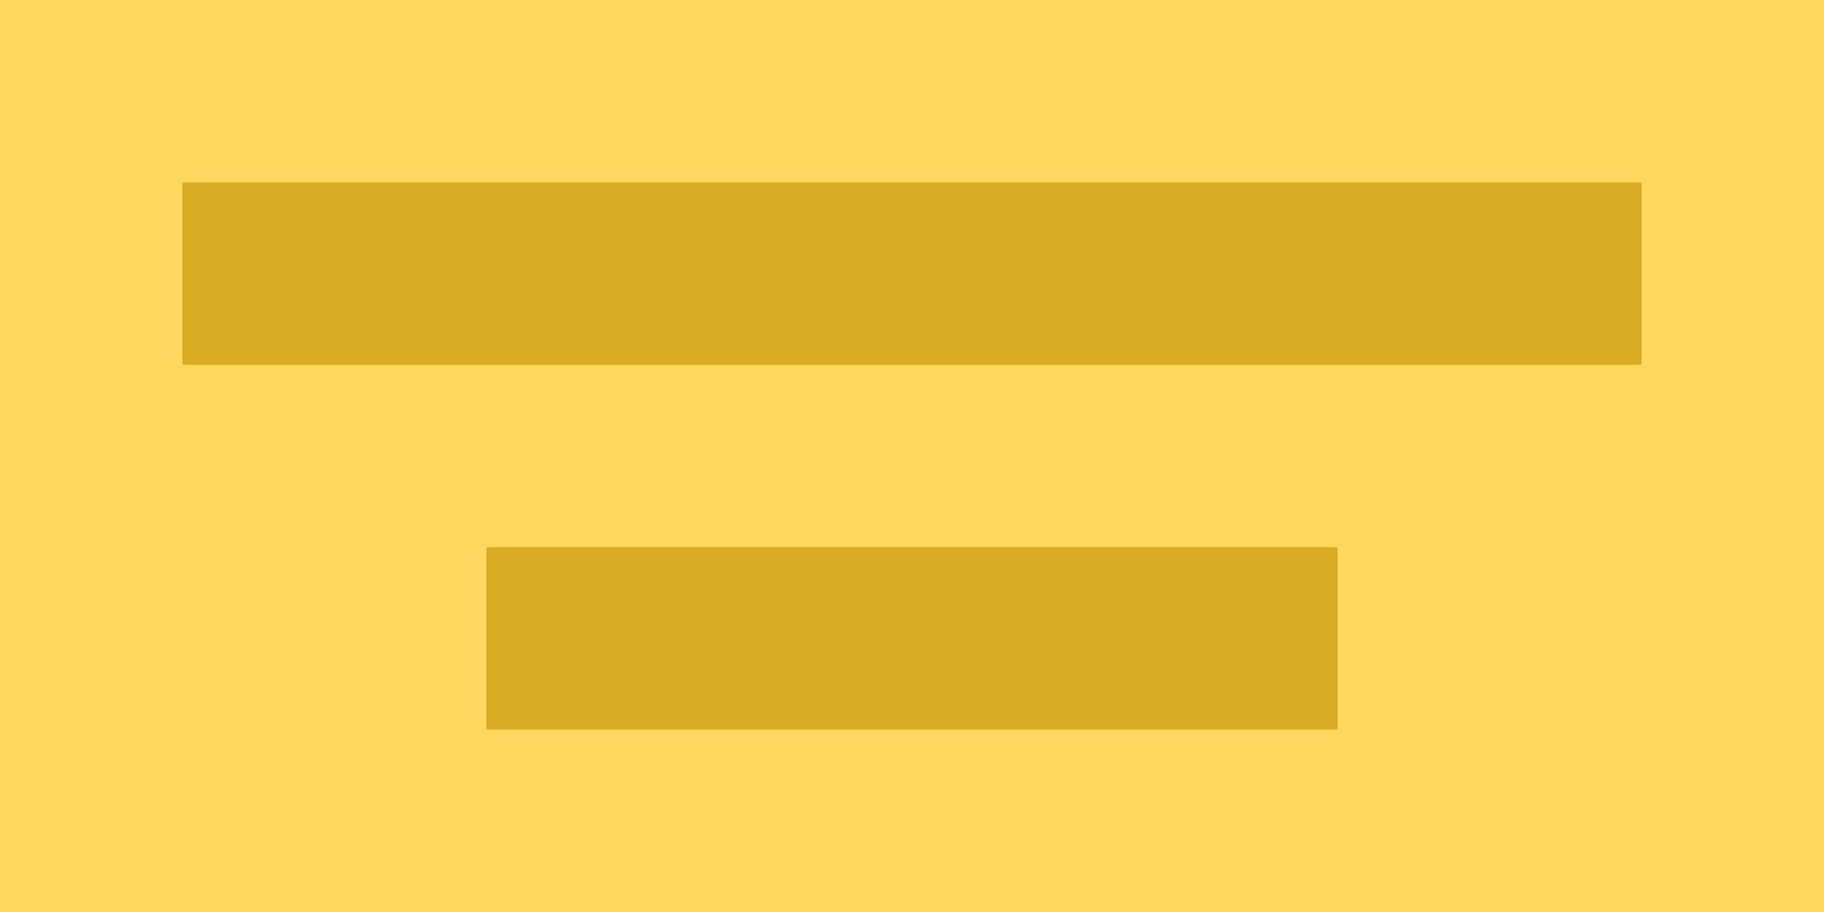 nameplate Clipart illustration in PNG, SVG